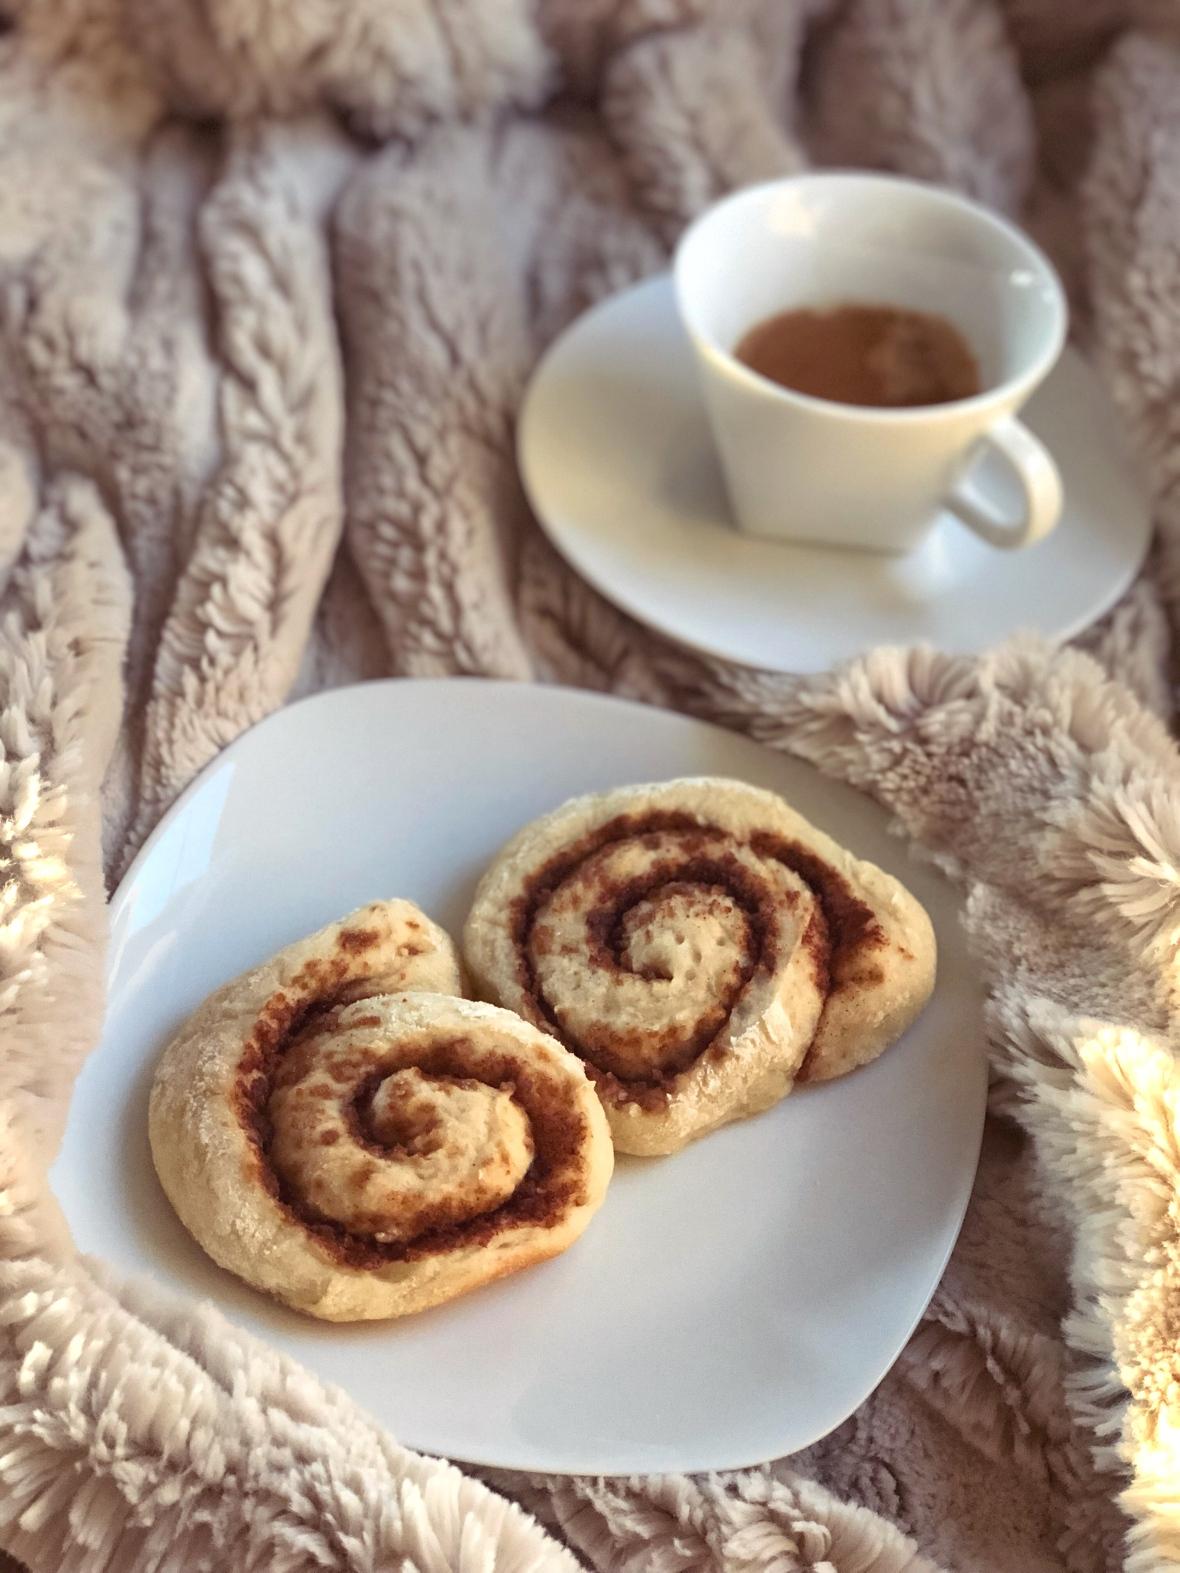 Cinnamon Roll Insta